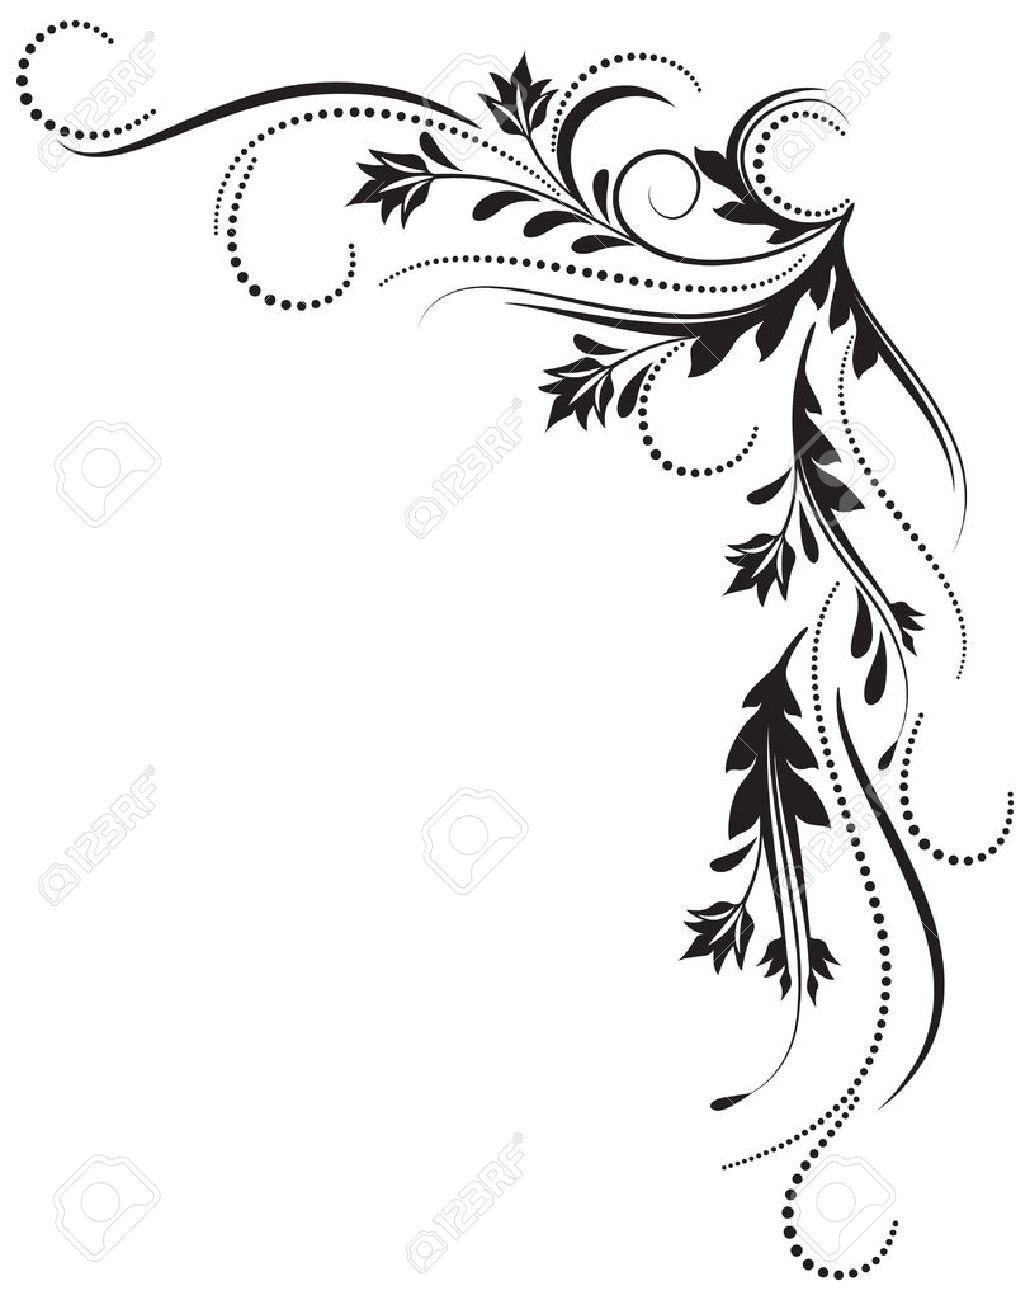 Decorative ornament for various design artwork Stock Vector - 10253754